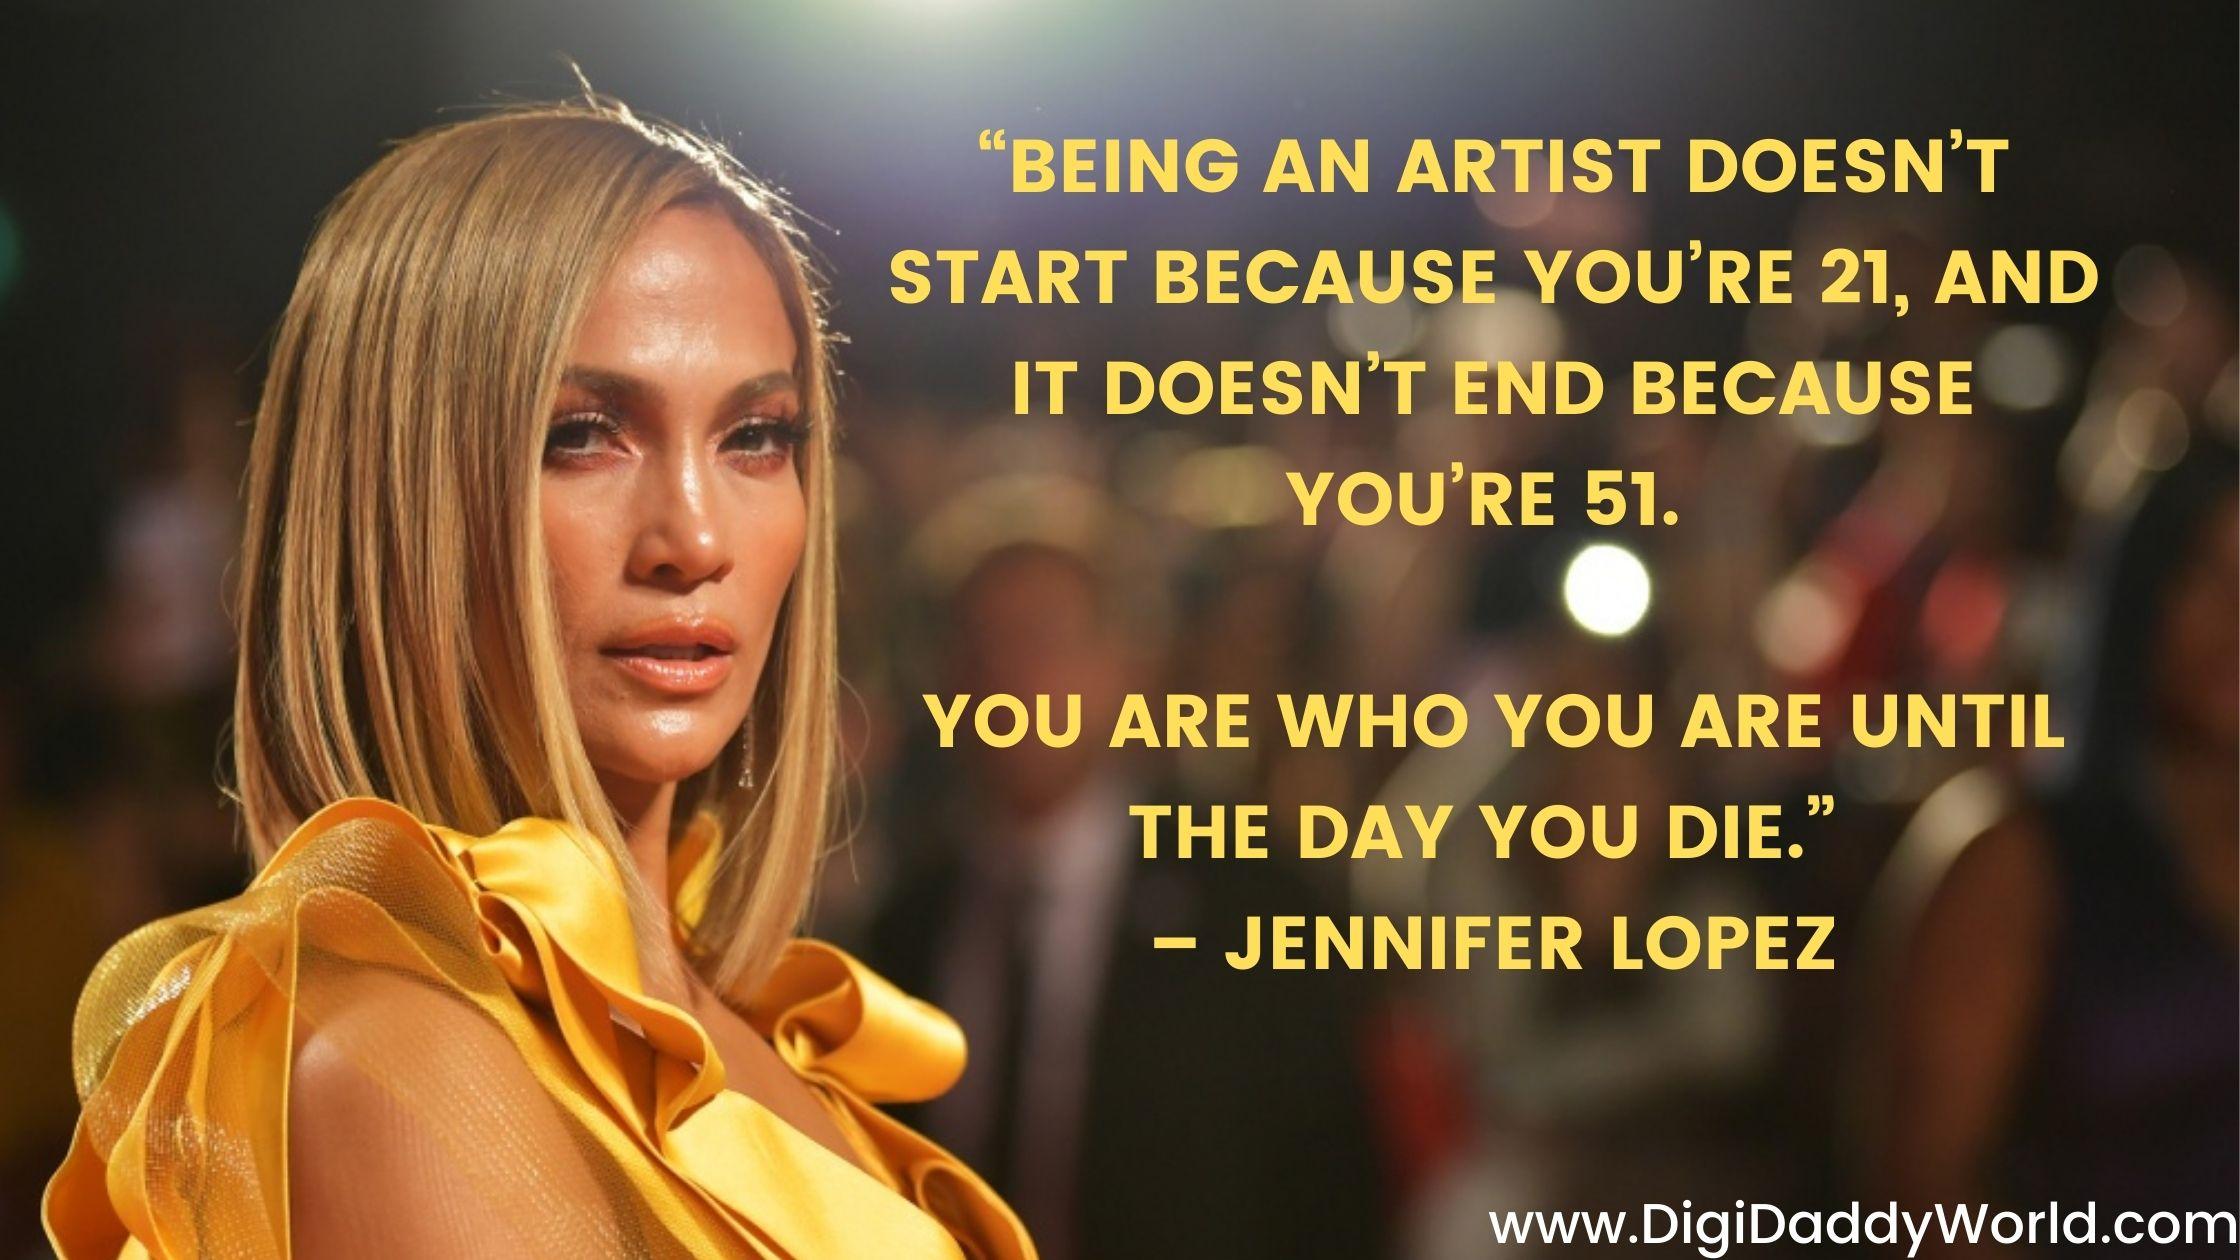 Jennifer Lopez Inspirational Quotes About Life, Success